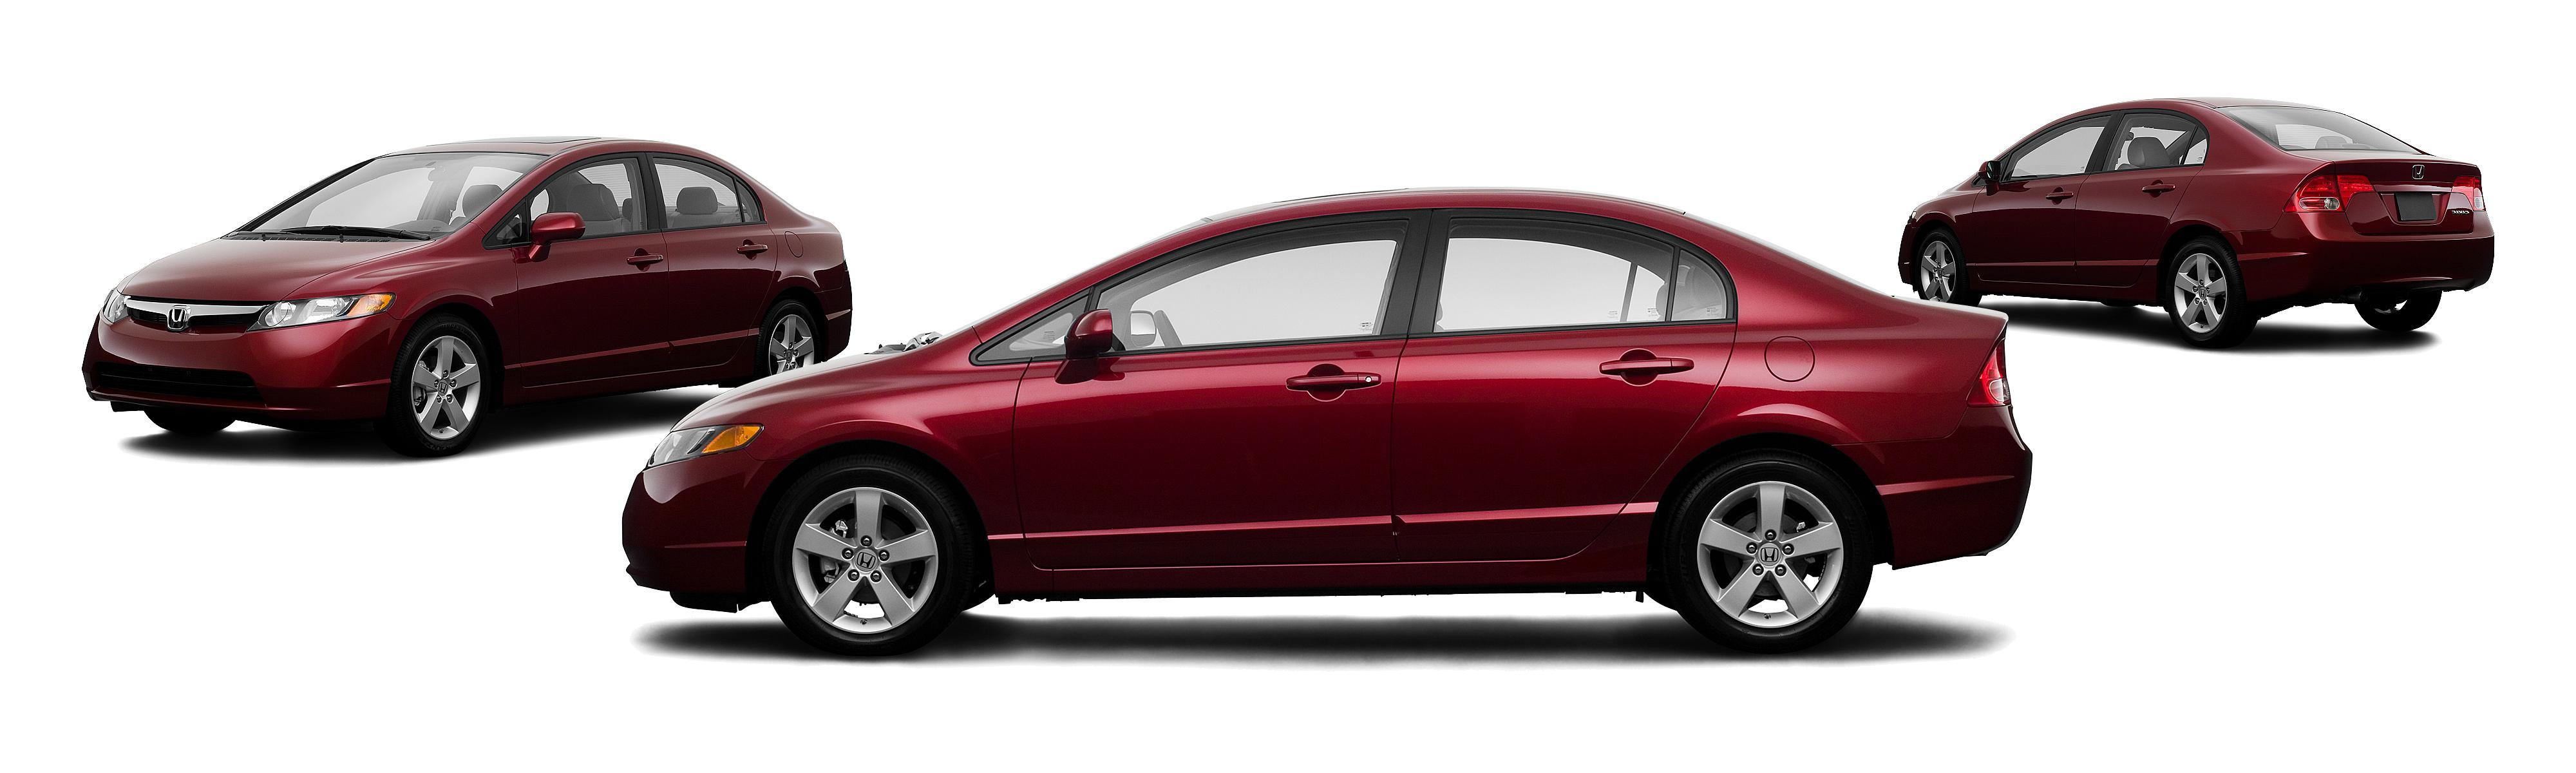 2008 Honda Civic EX 4dr Sedan 5M Research GrooveCar